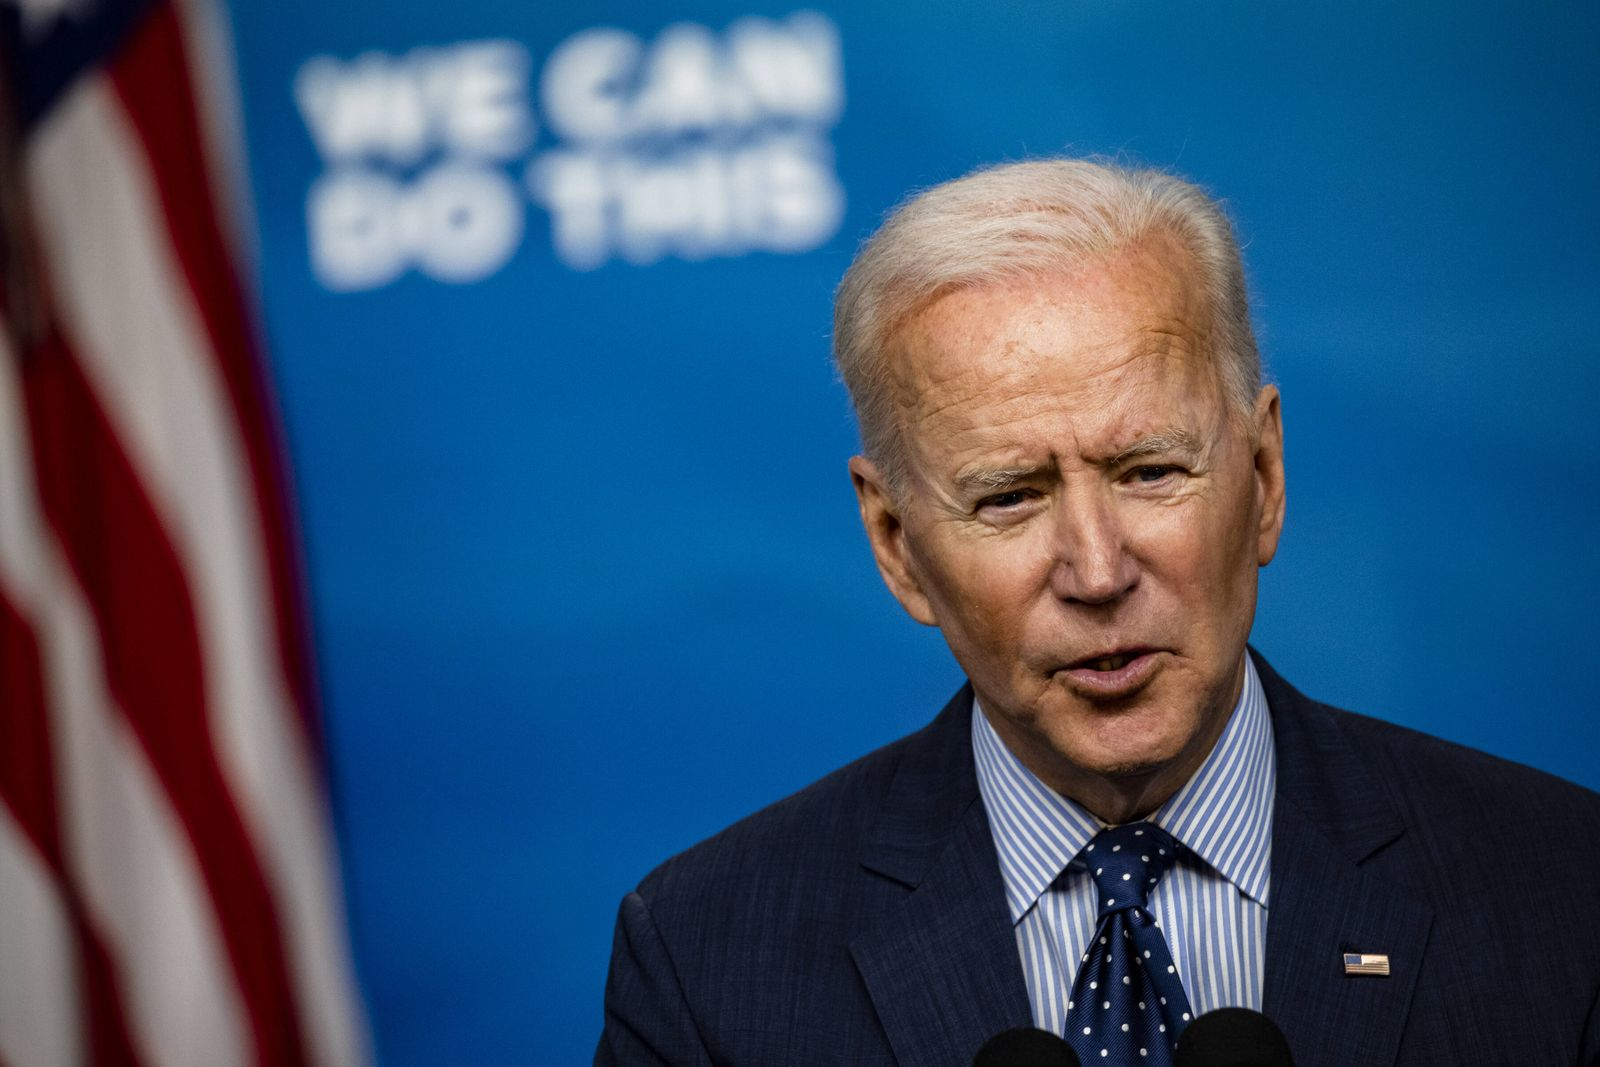 U.S. President Joe Biden speaks in the Eisenhower Executive Office Building in Washington, DC on Wednesday, June 2, 202